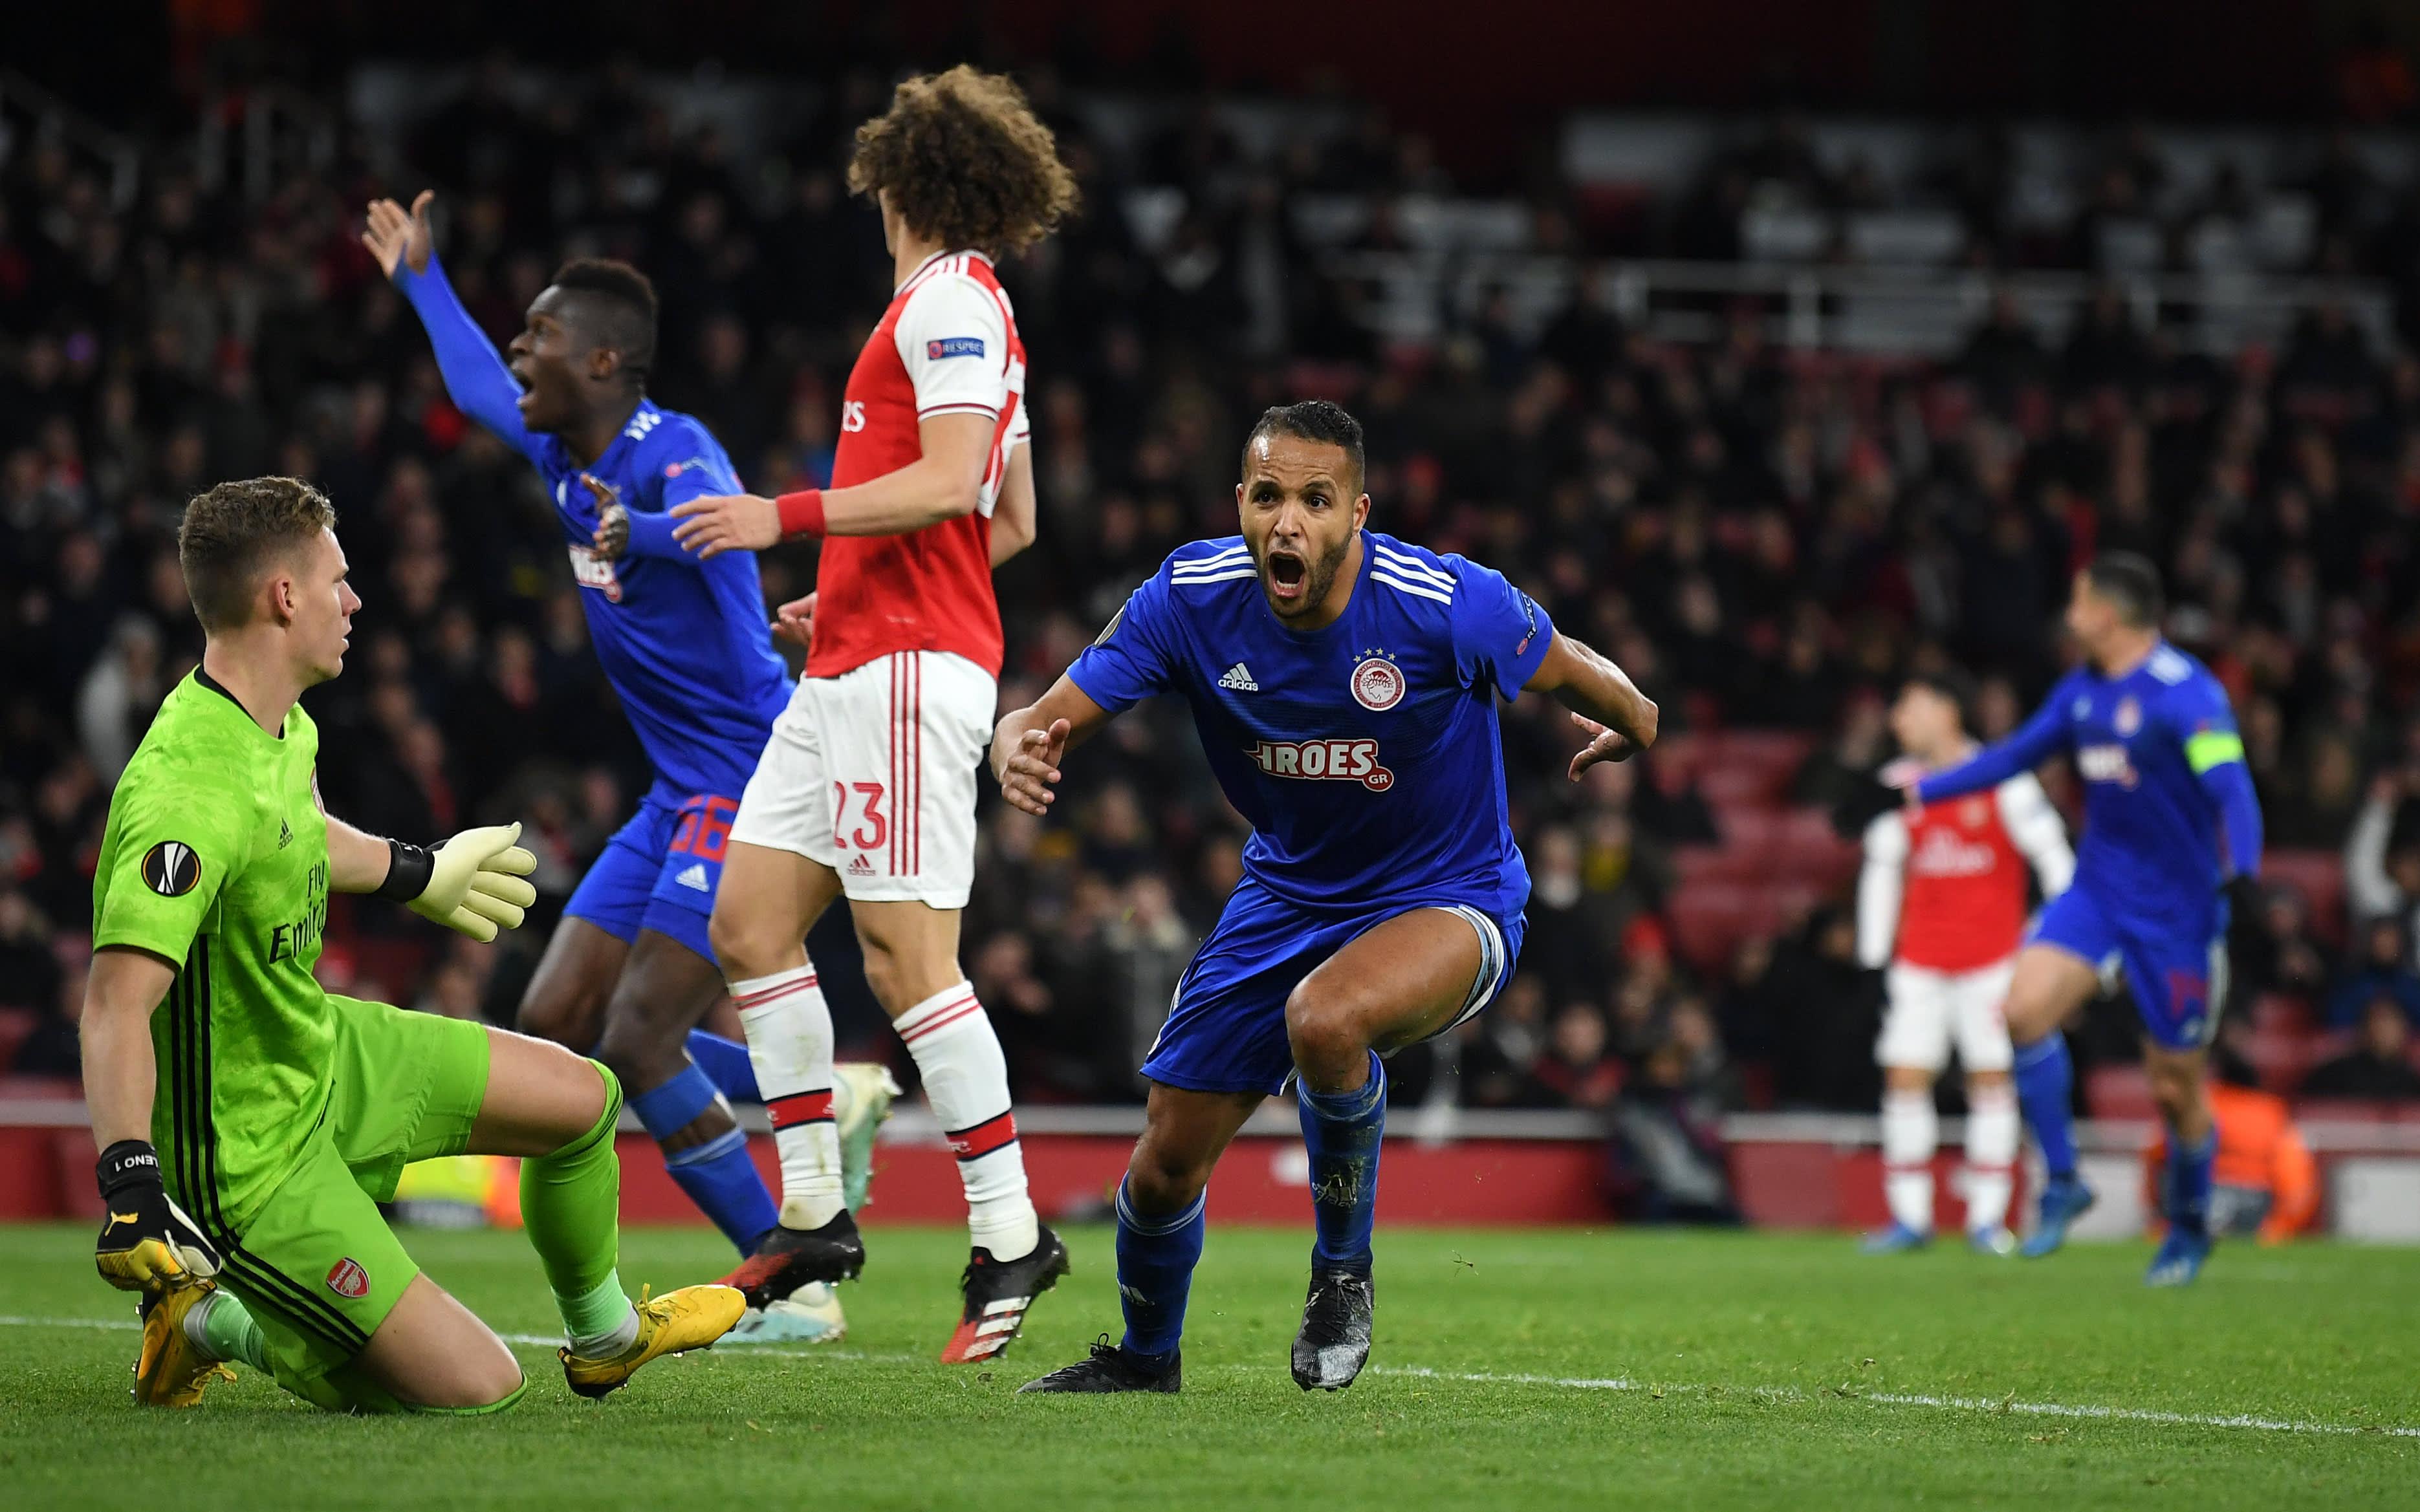 Olympiakosin Youssef El Arabi upottaa Arsenalin Eurooppa-liigasta